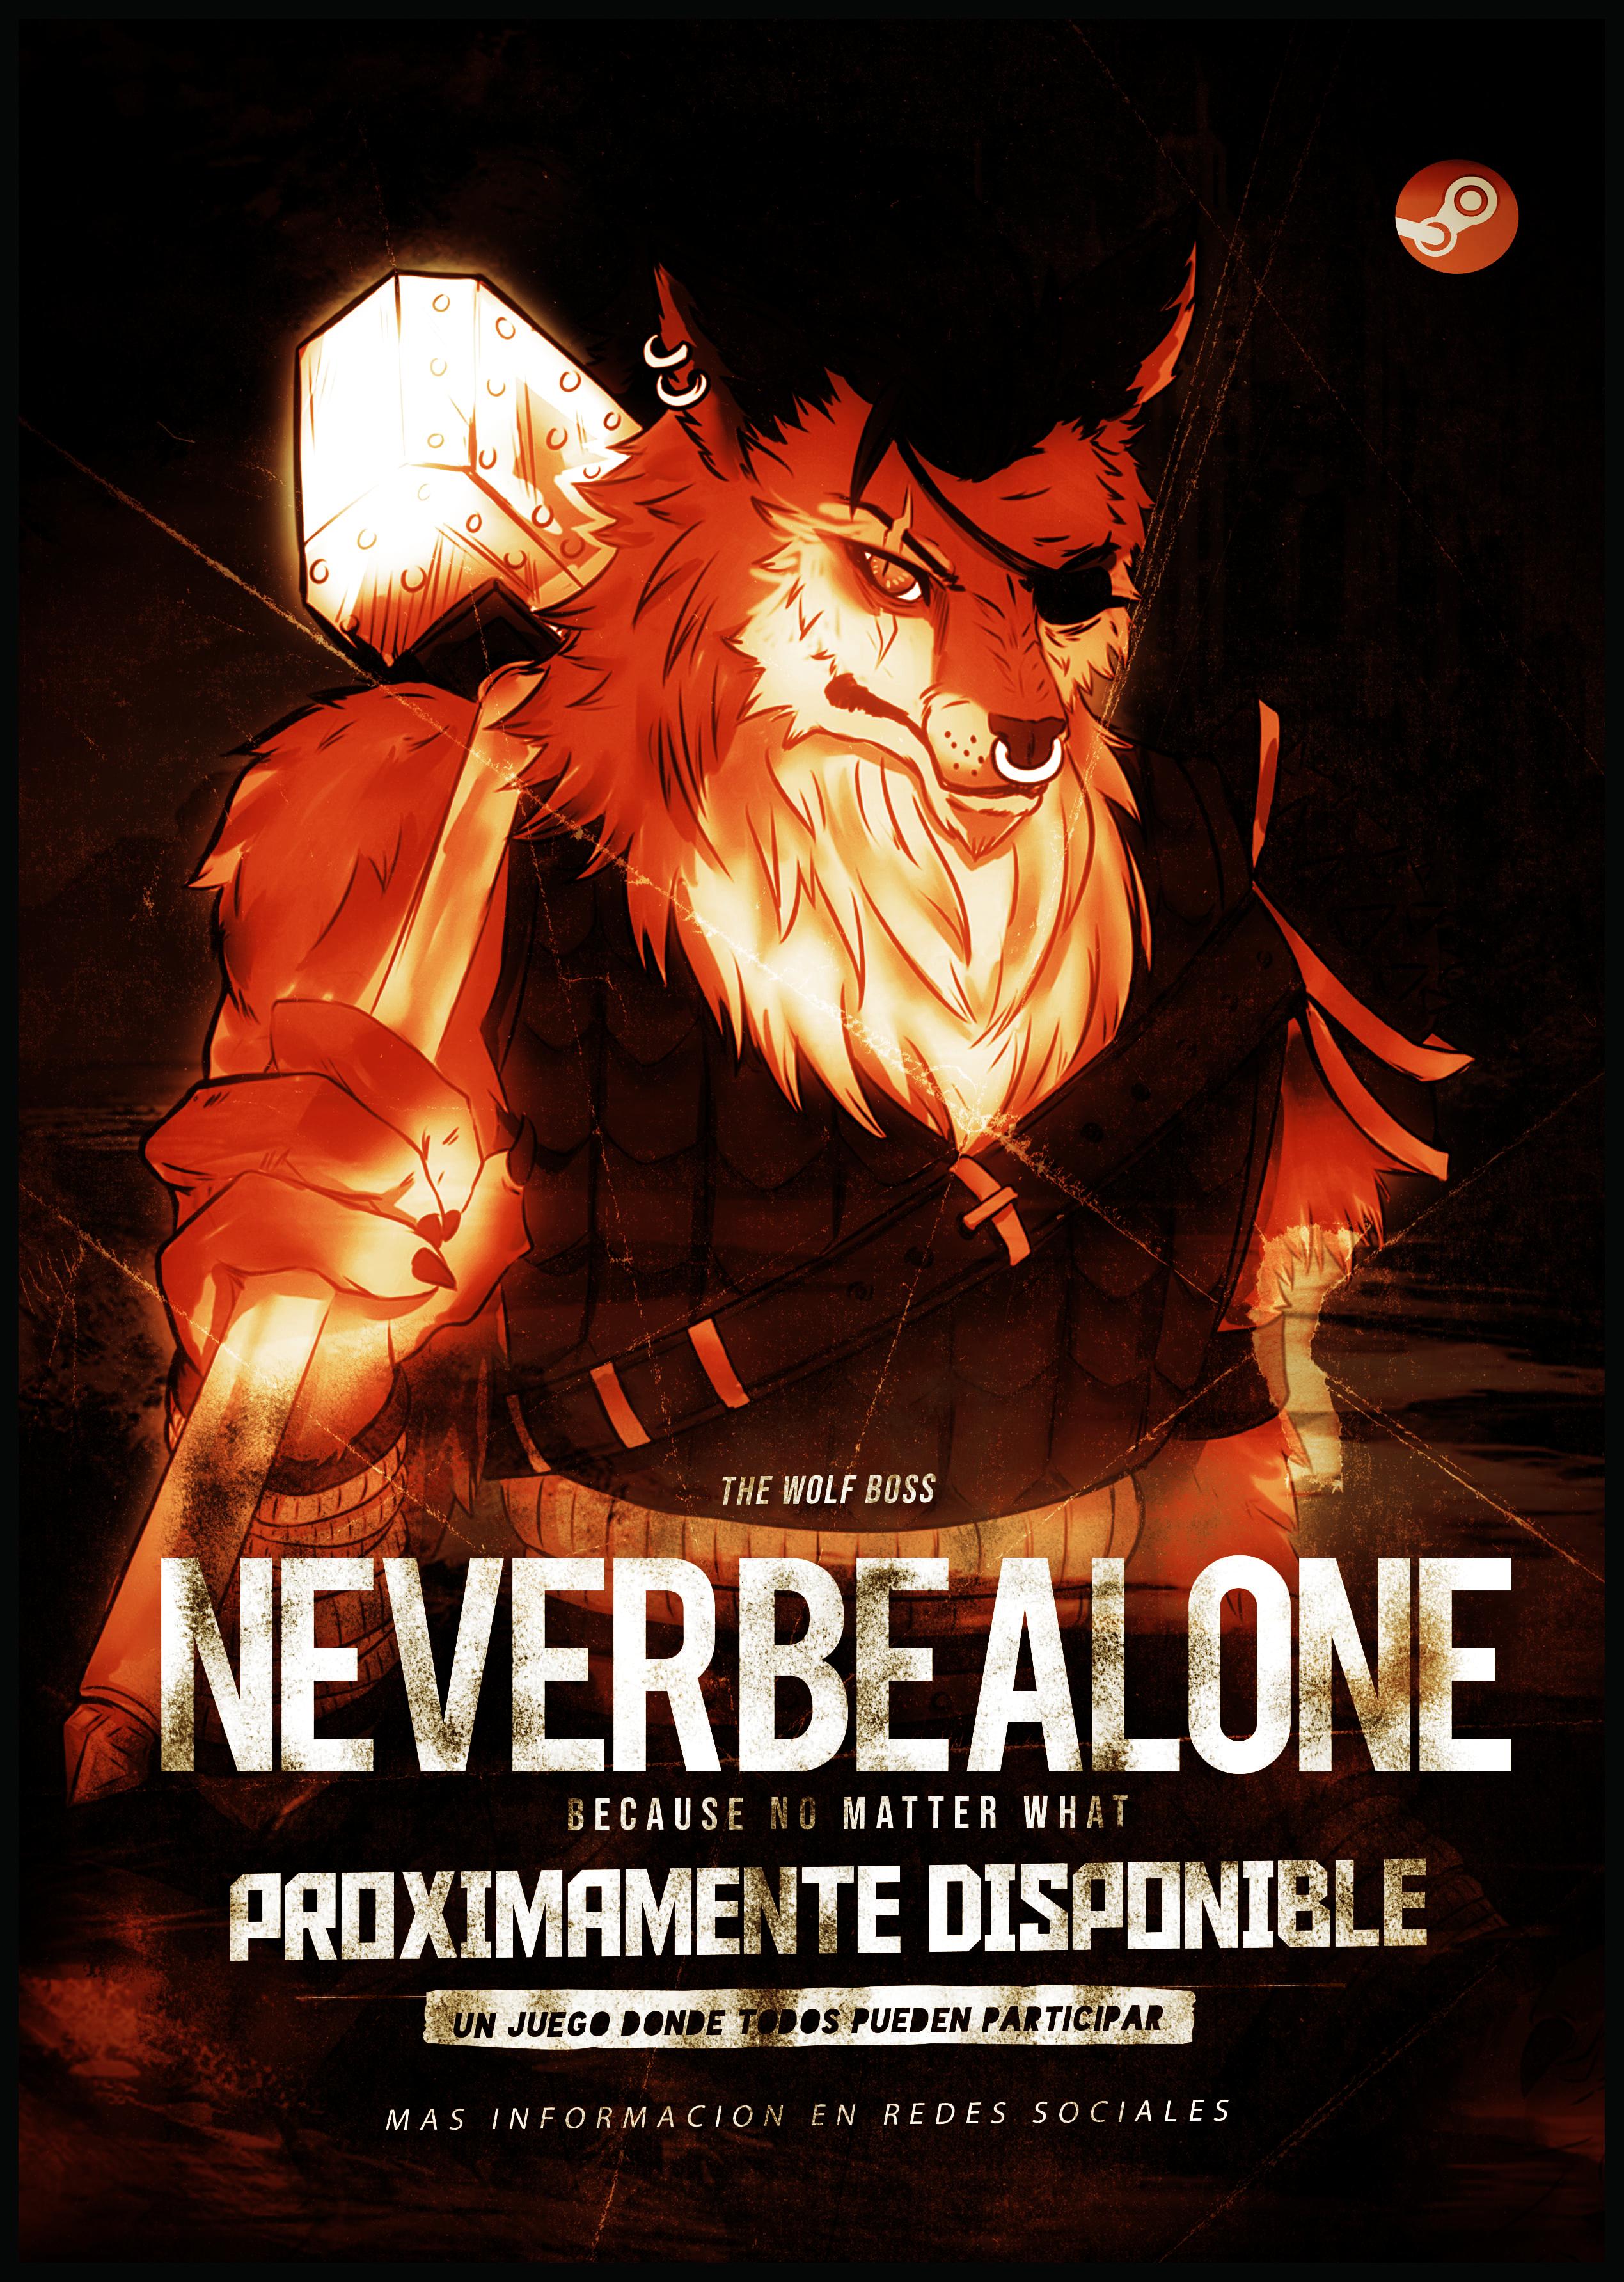 Never-Be-Alone-Wolf-Boss